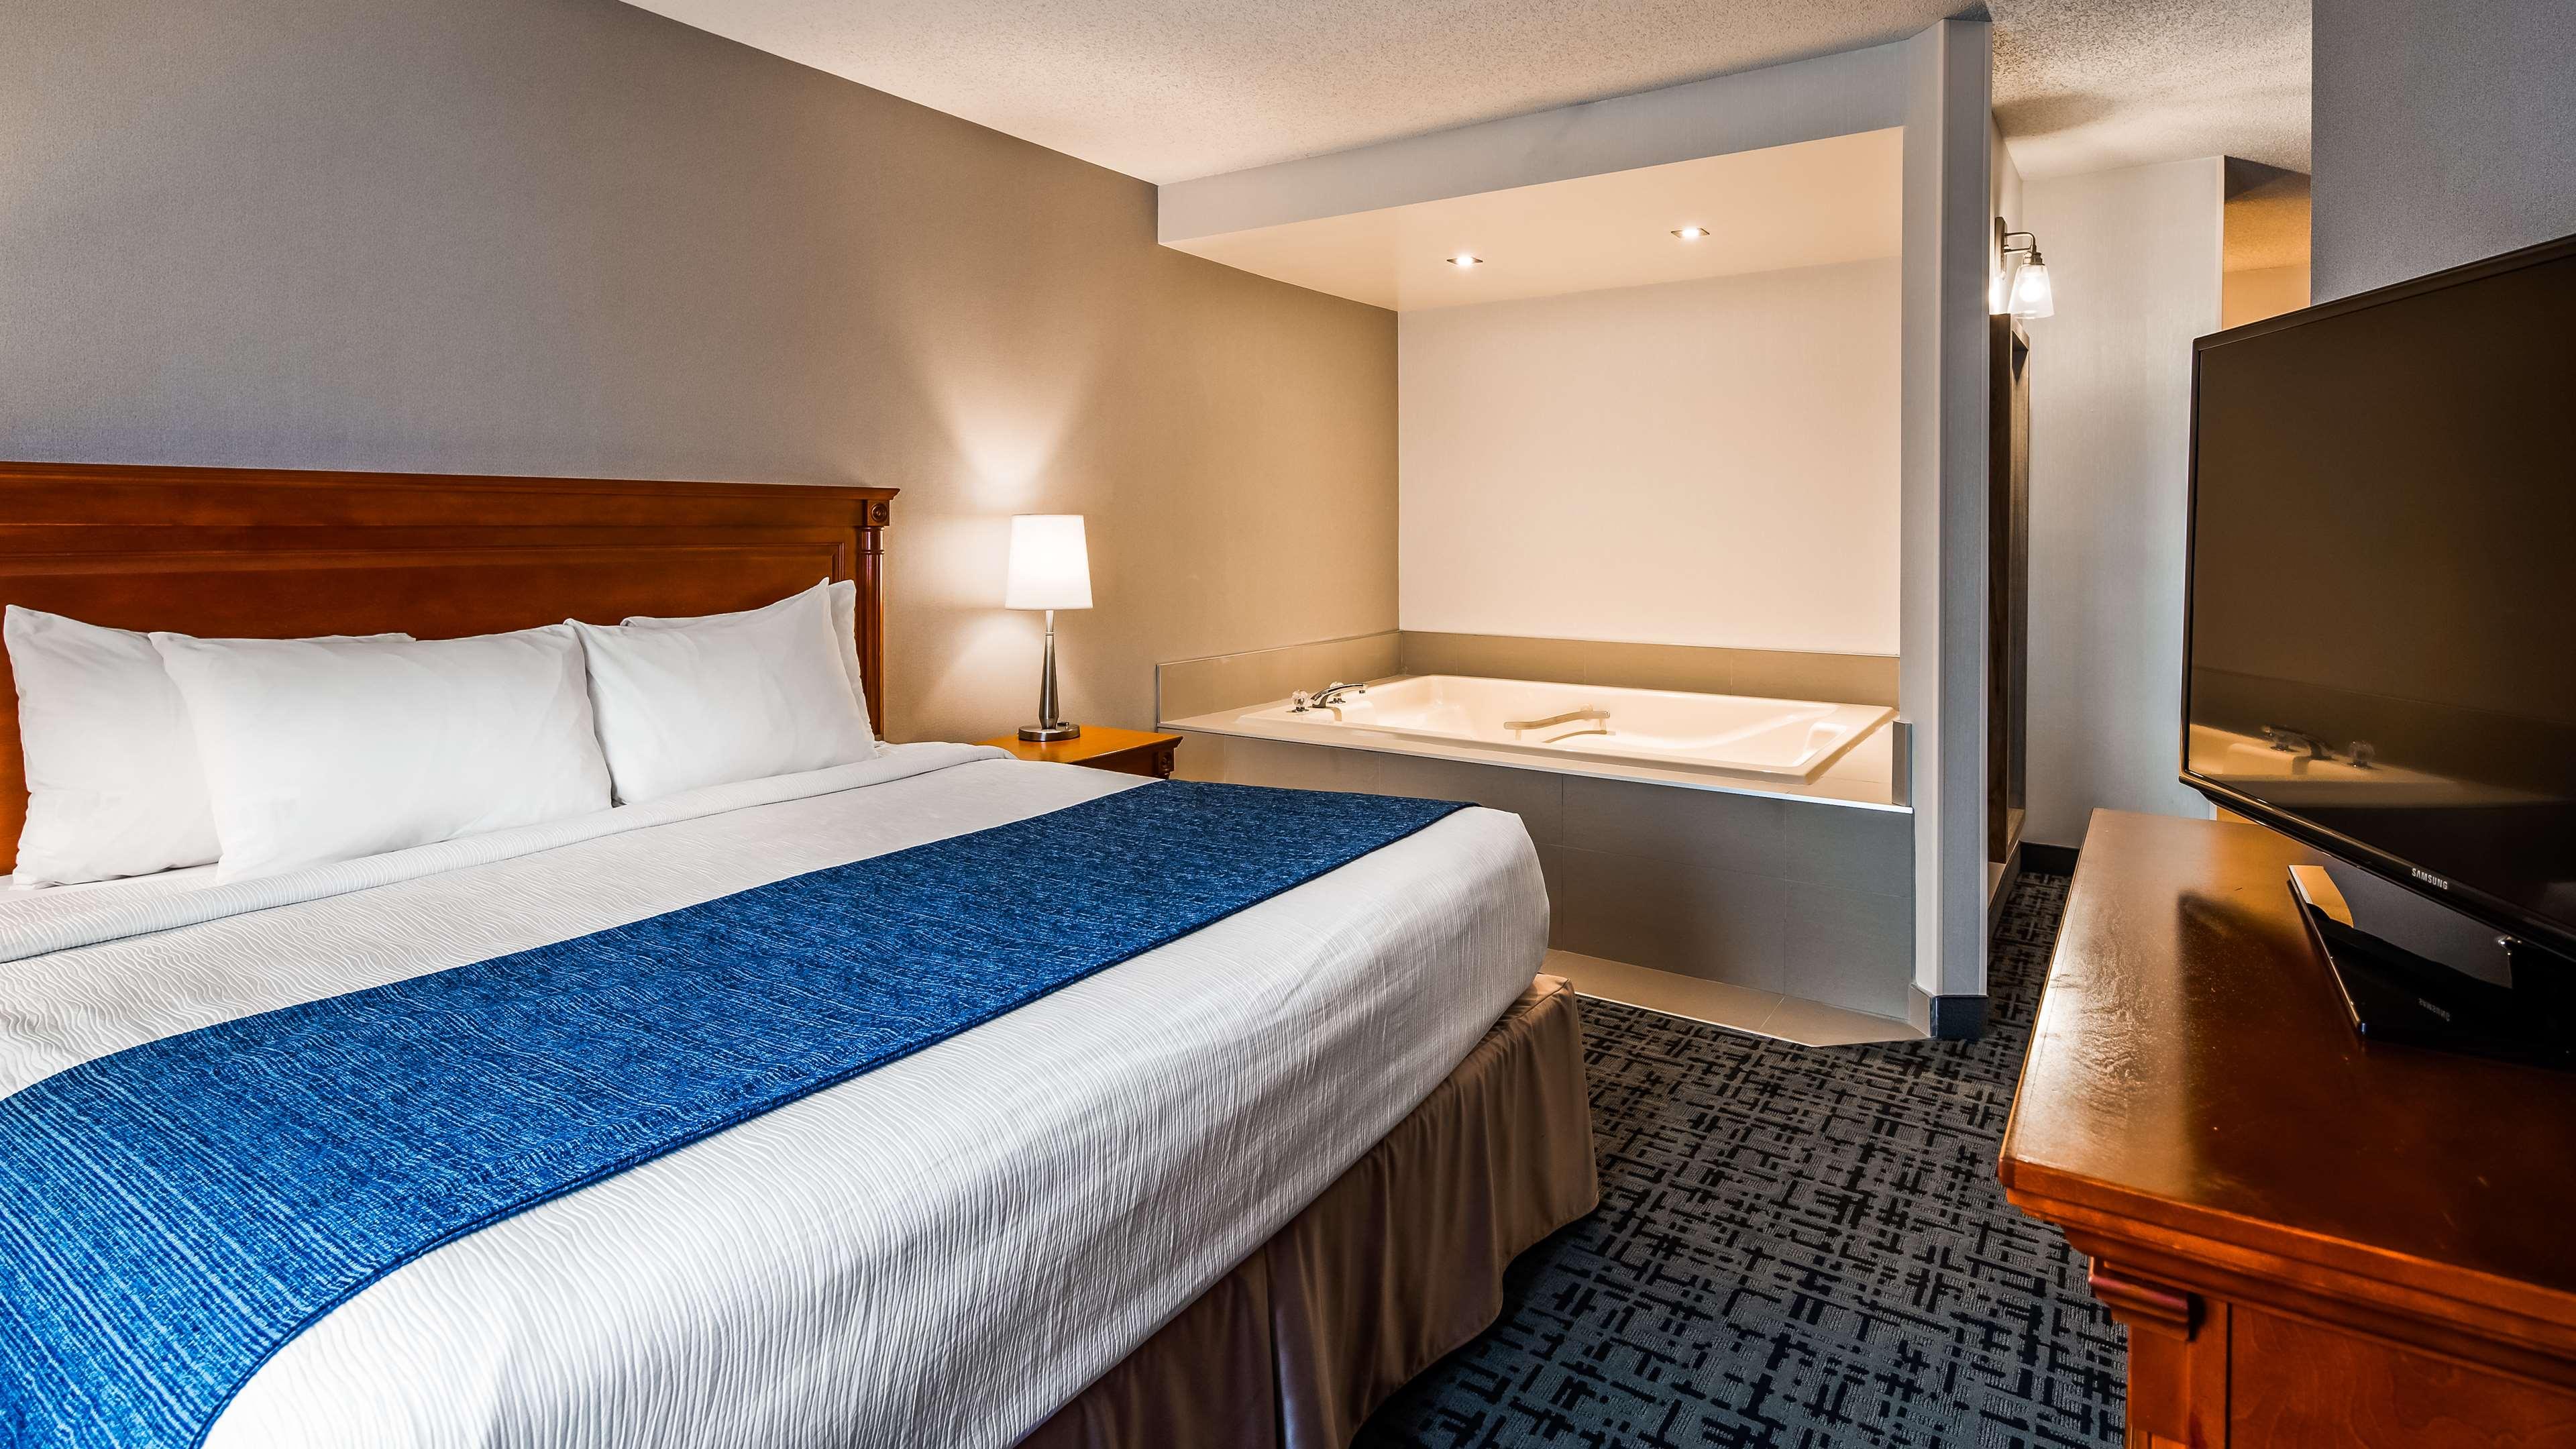 Best Western Hotel Brossard à Brossard: Guest Room